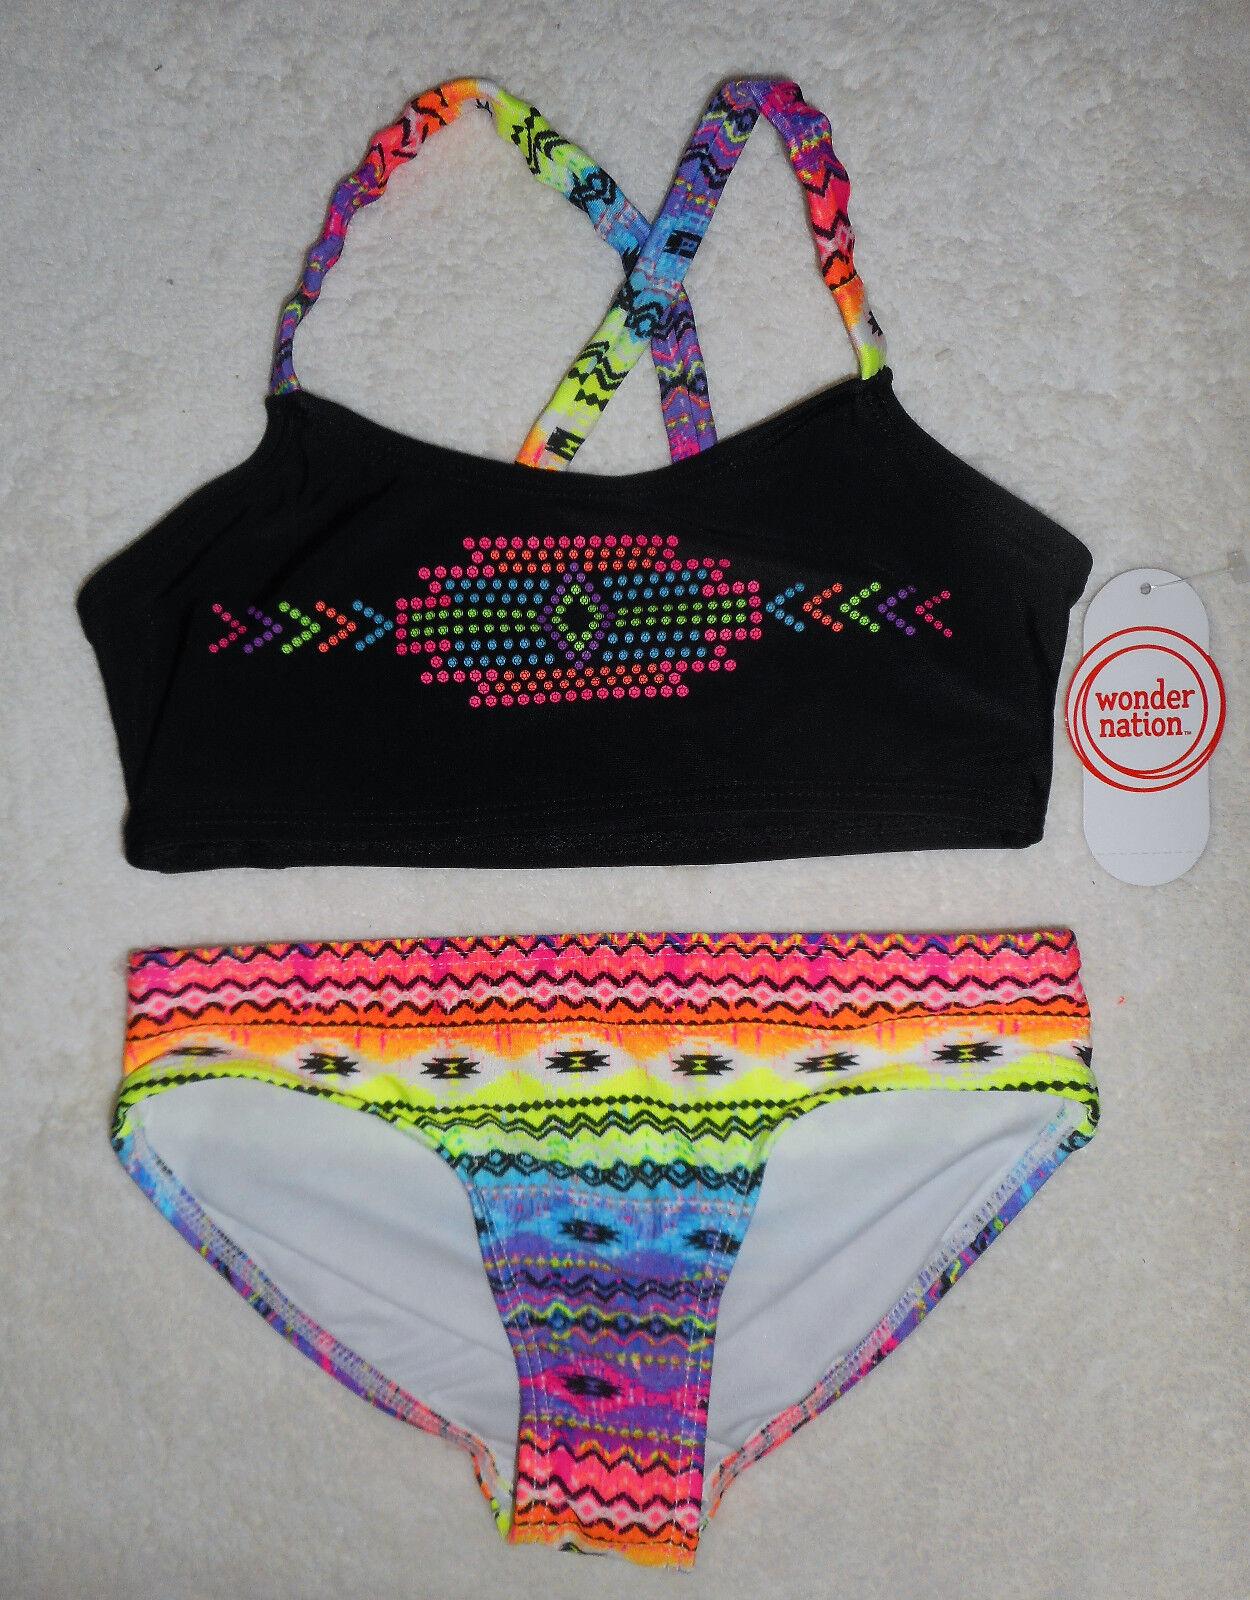 Mädchen 👣 Bikini Badeanzug 👣 2tlg 👣 SCHWARZ 👣 bunt